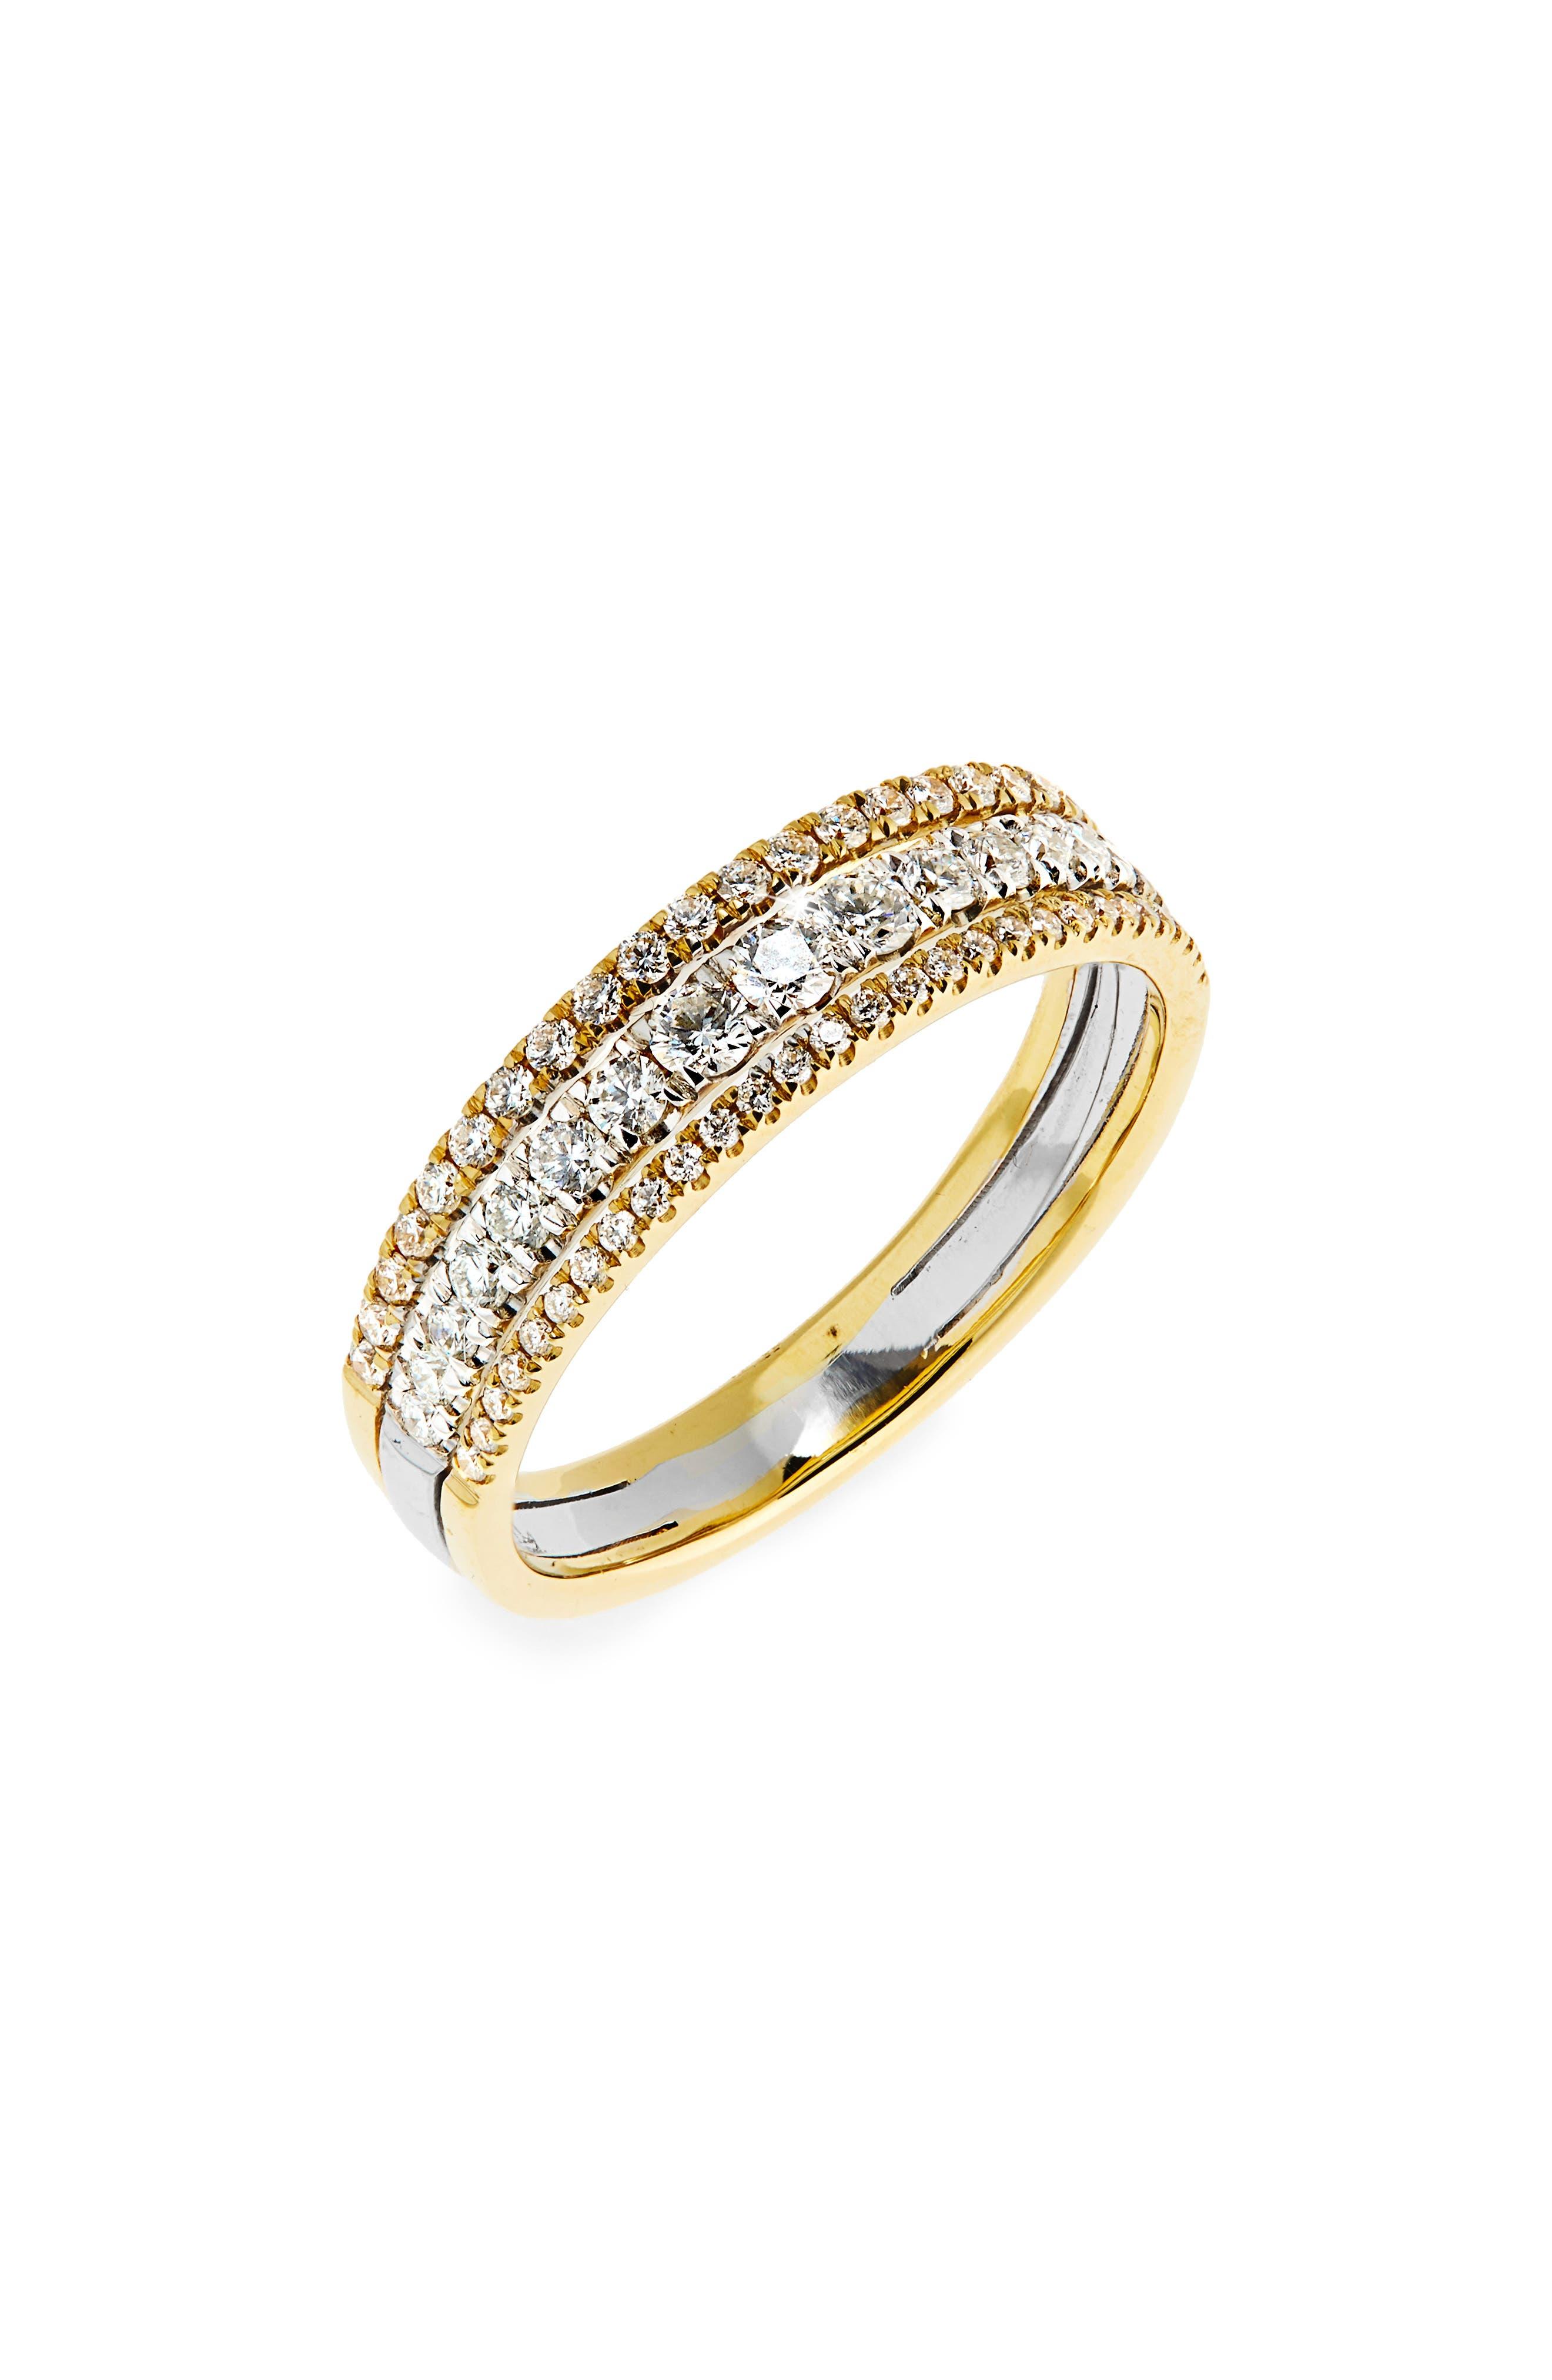 Diamond Stack Ring,                             Main thumbnail 1, color,                             Yellow Gold/ White Gold